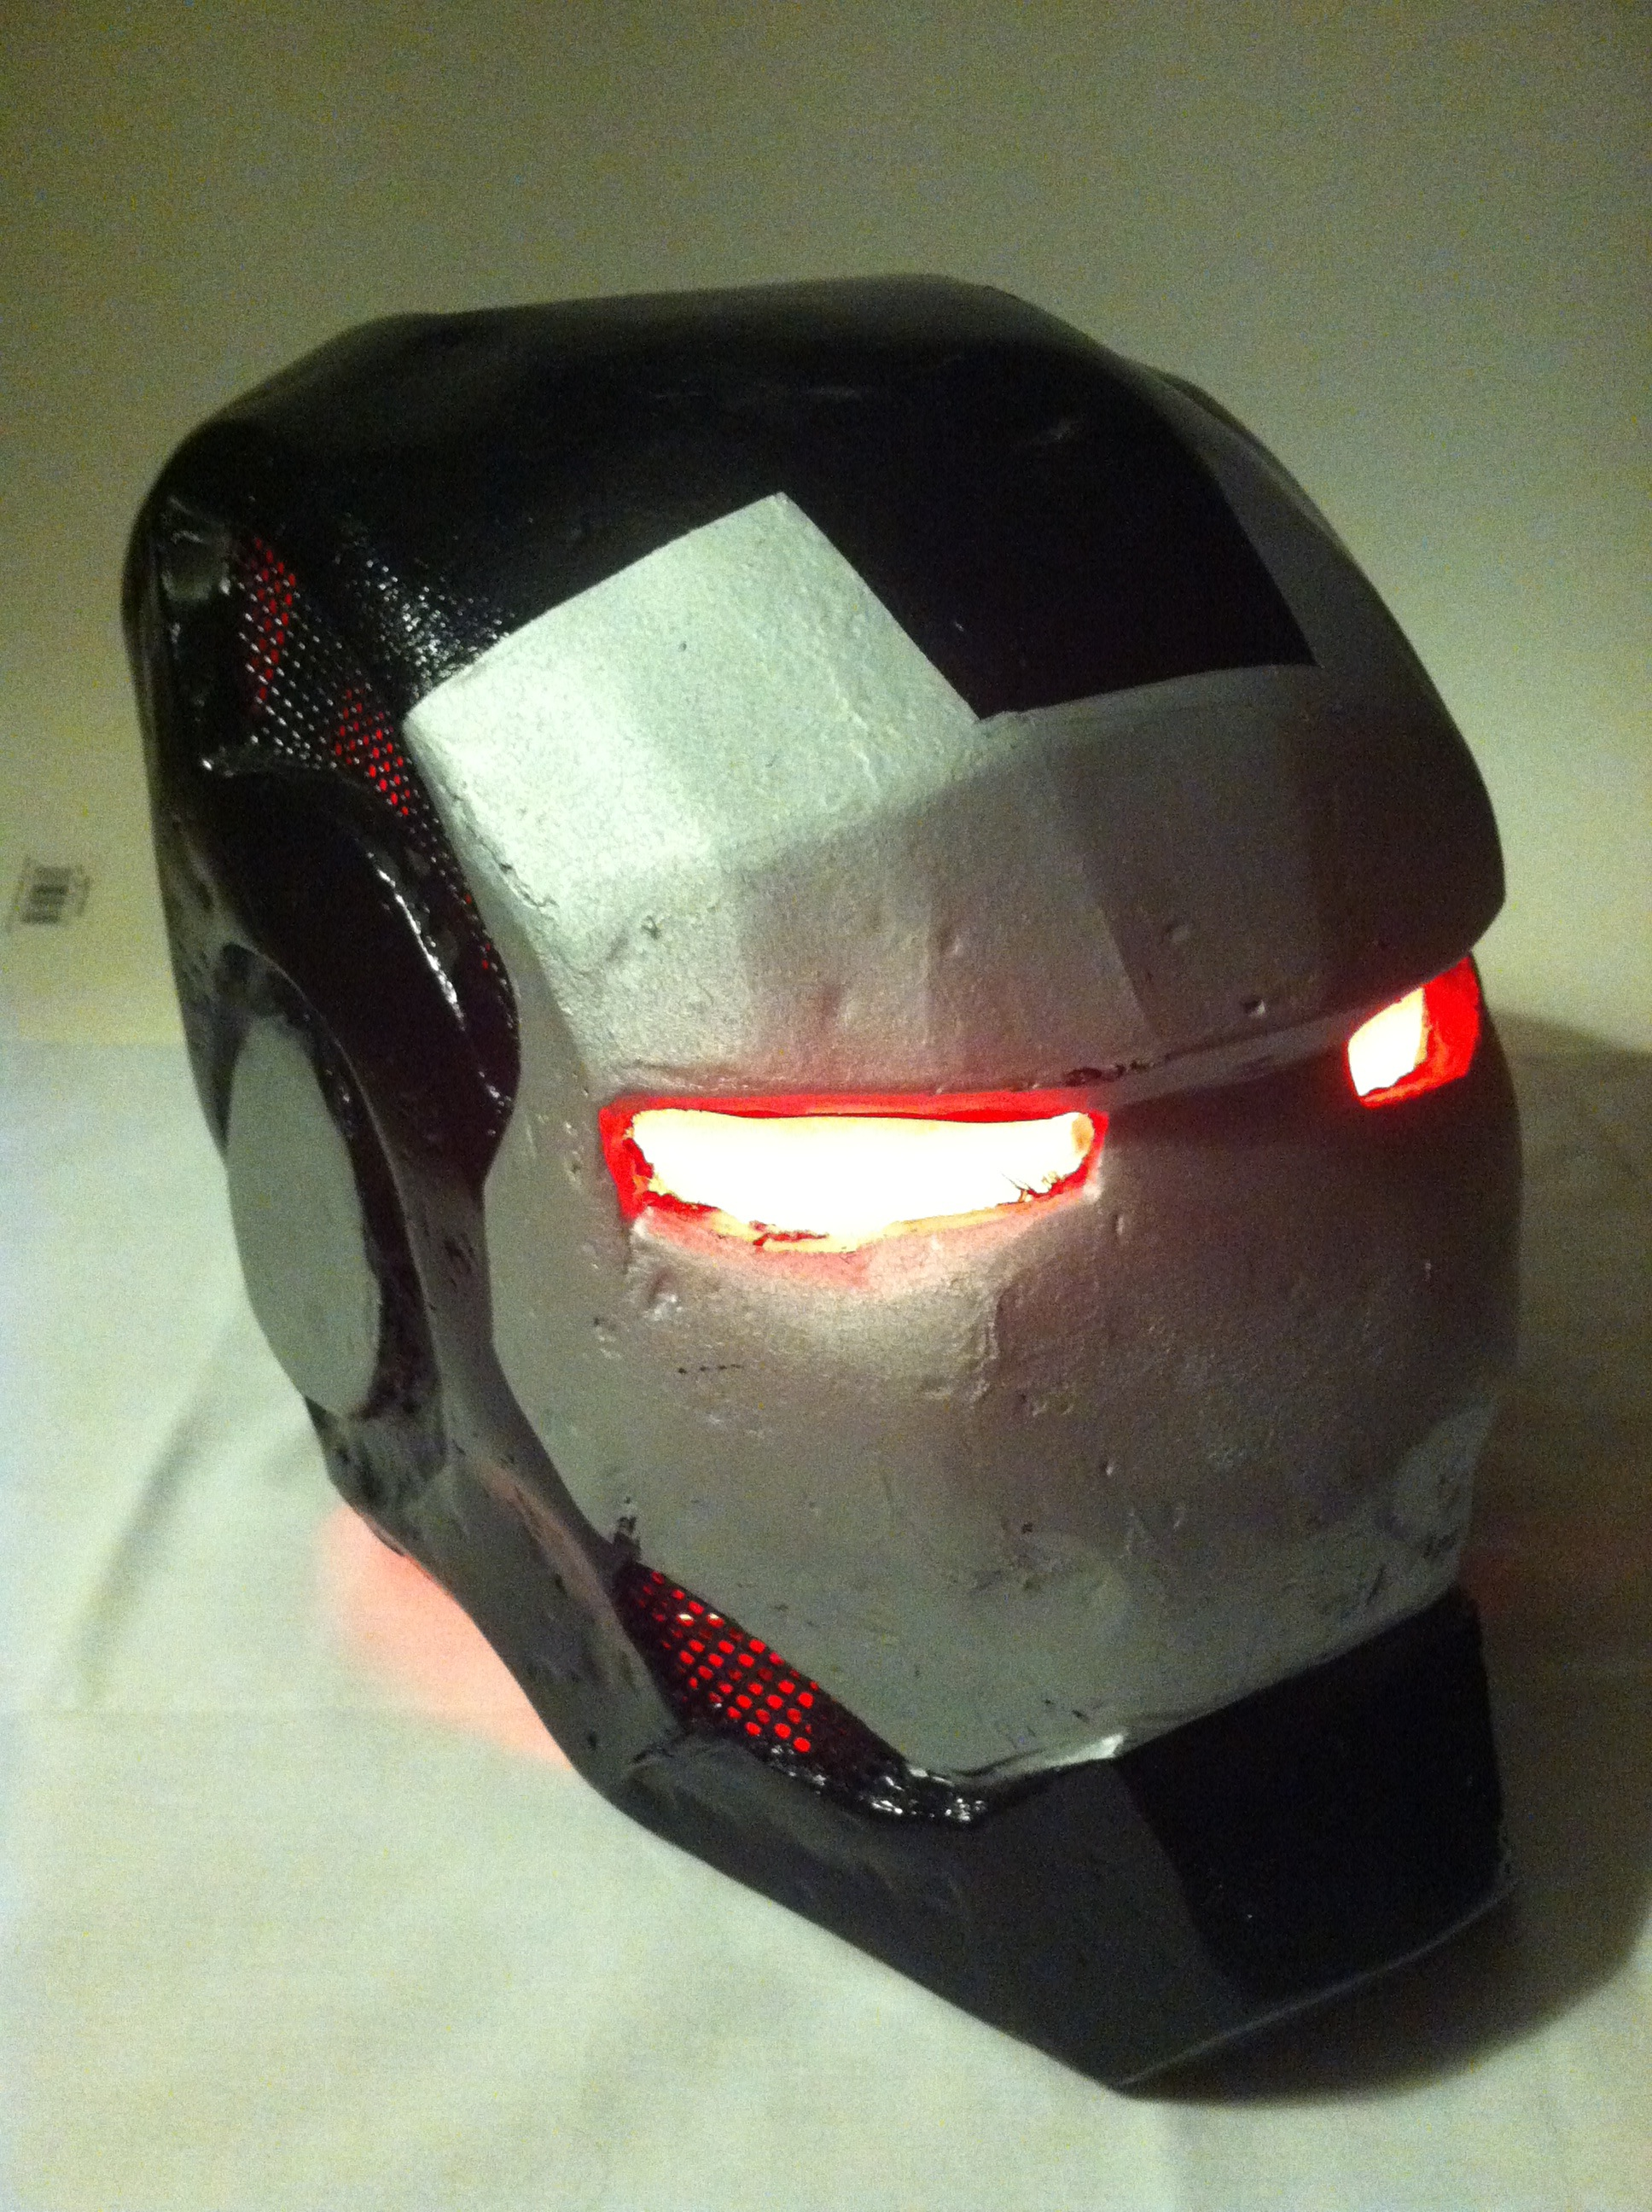 War Machine Helmet with LEDs